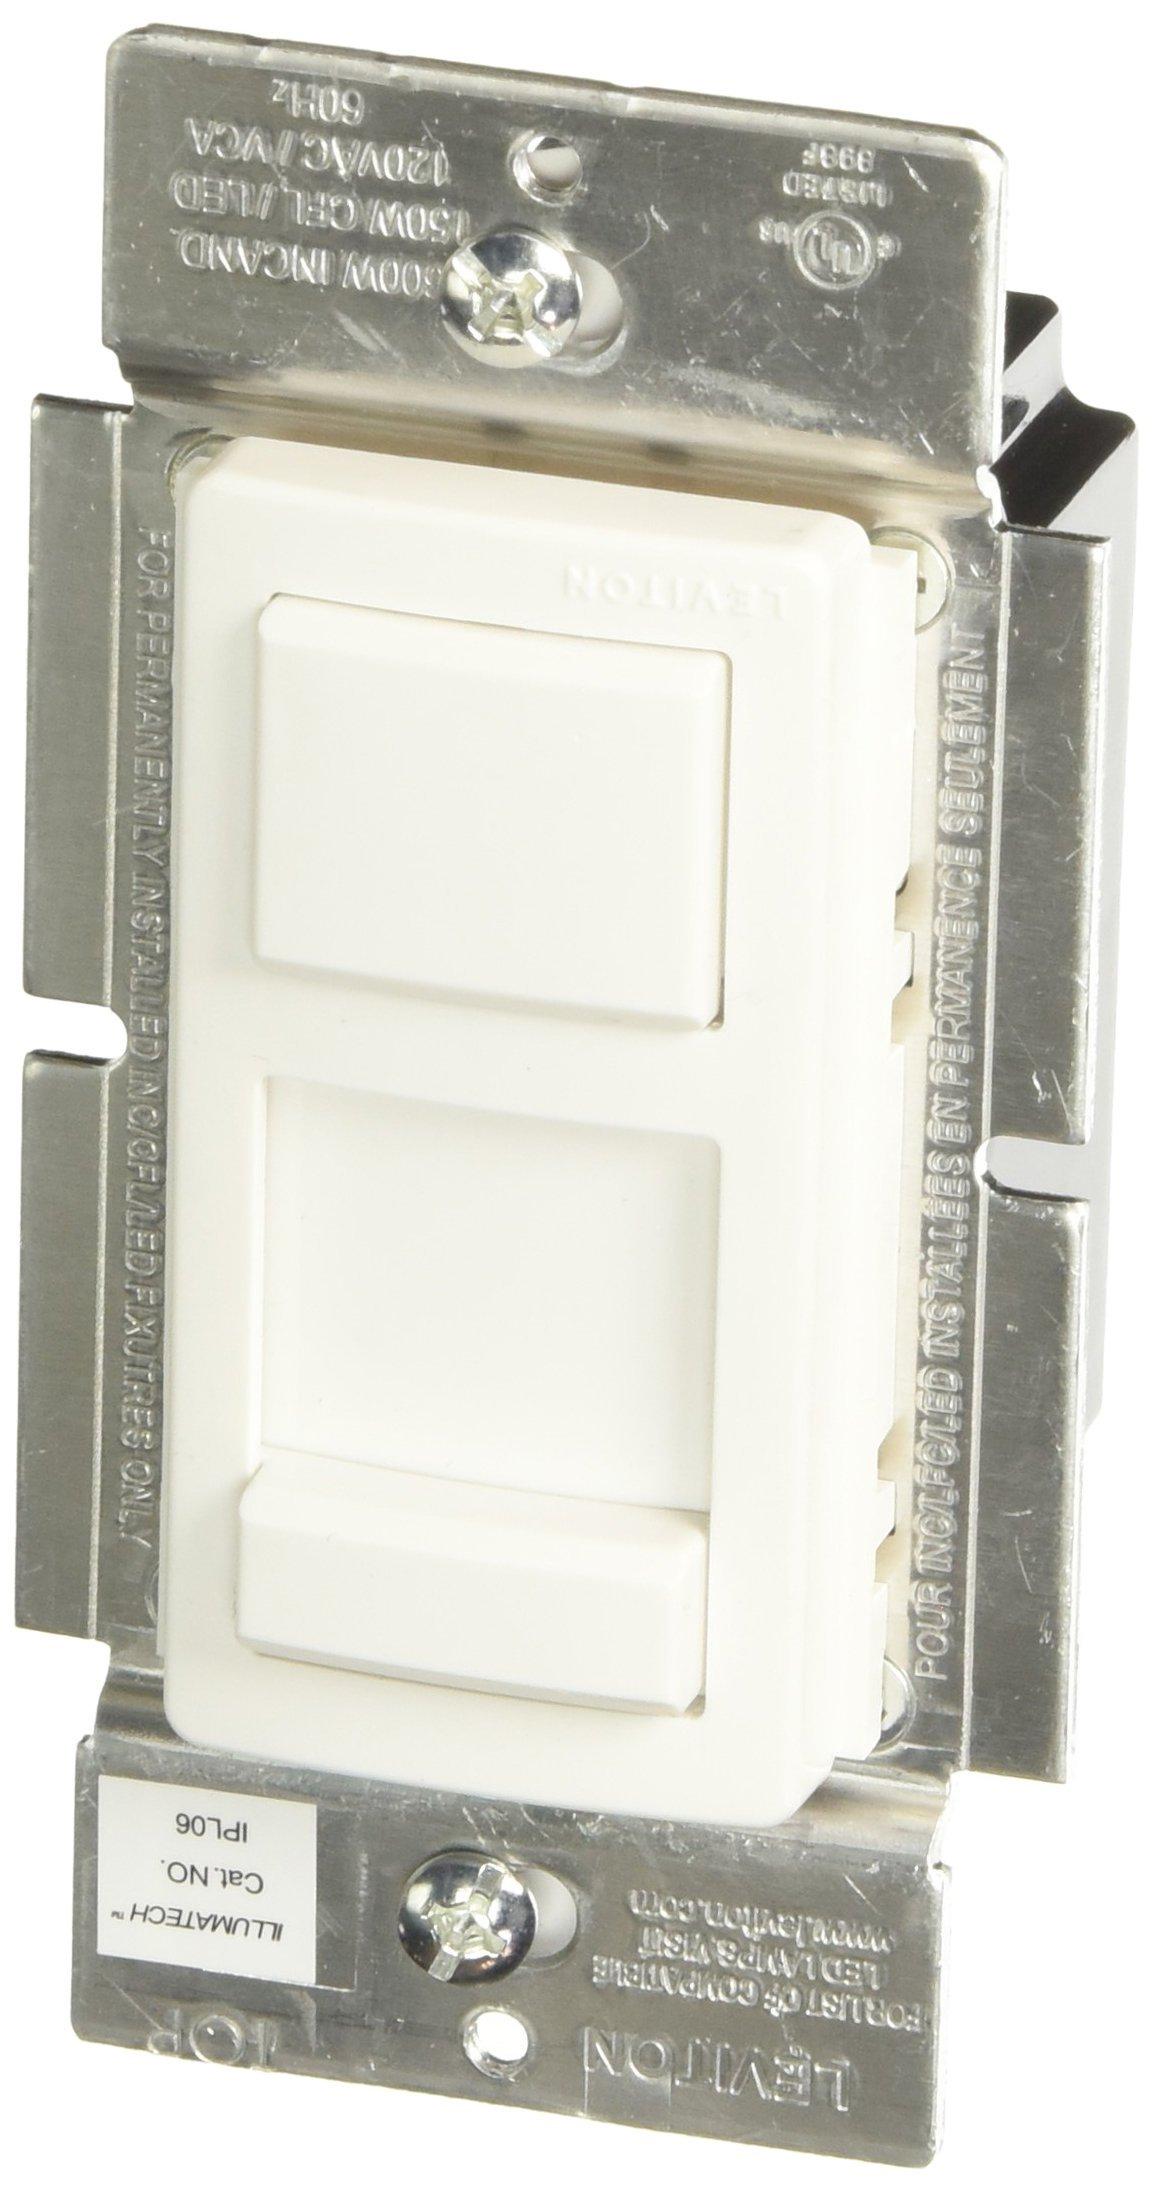 Leviton R50-IPL06-10M Single Pole 3 Way 120V Preset Slide Dimmer 需配变压器